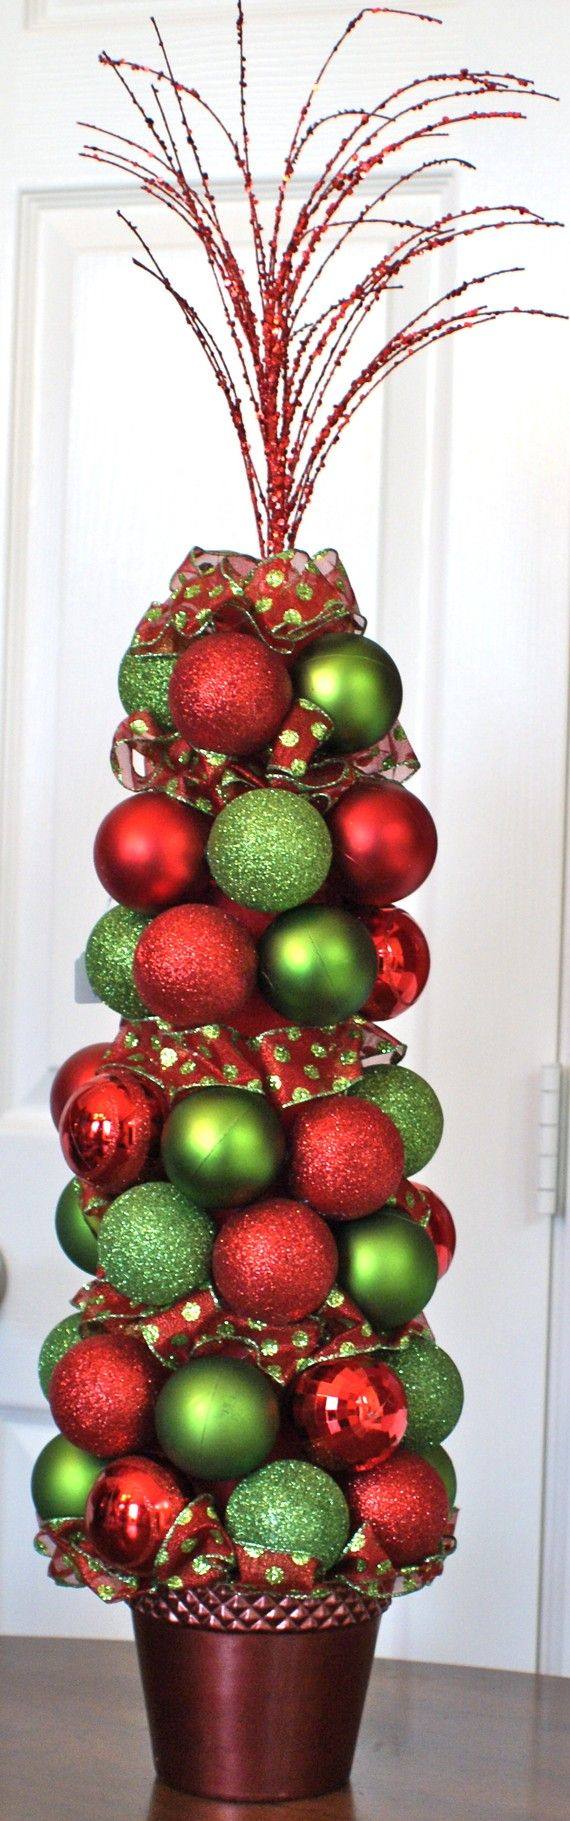 ornament topiary....DIY for me